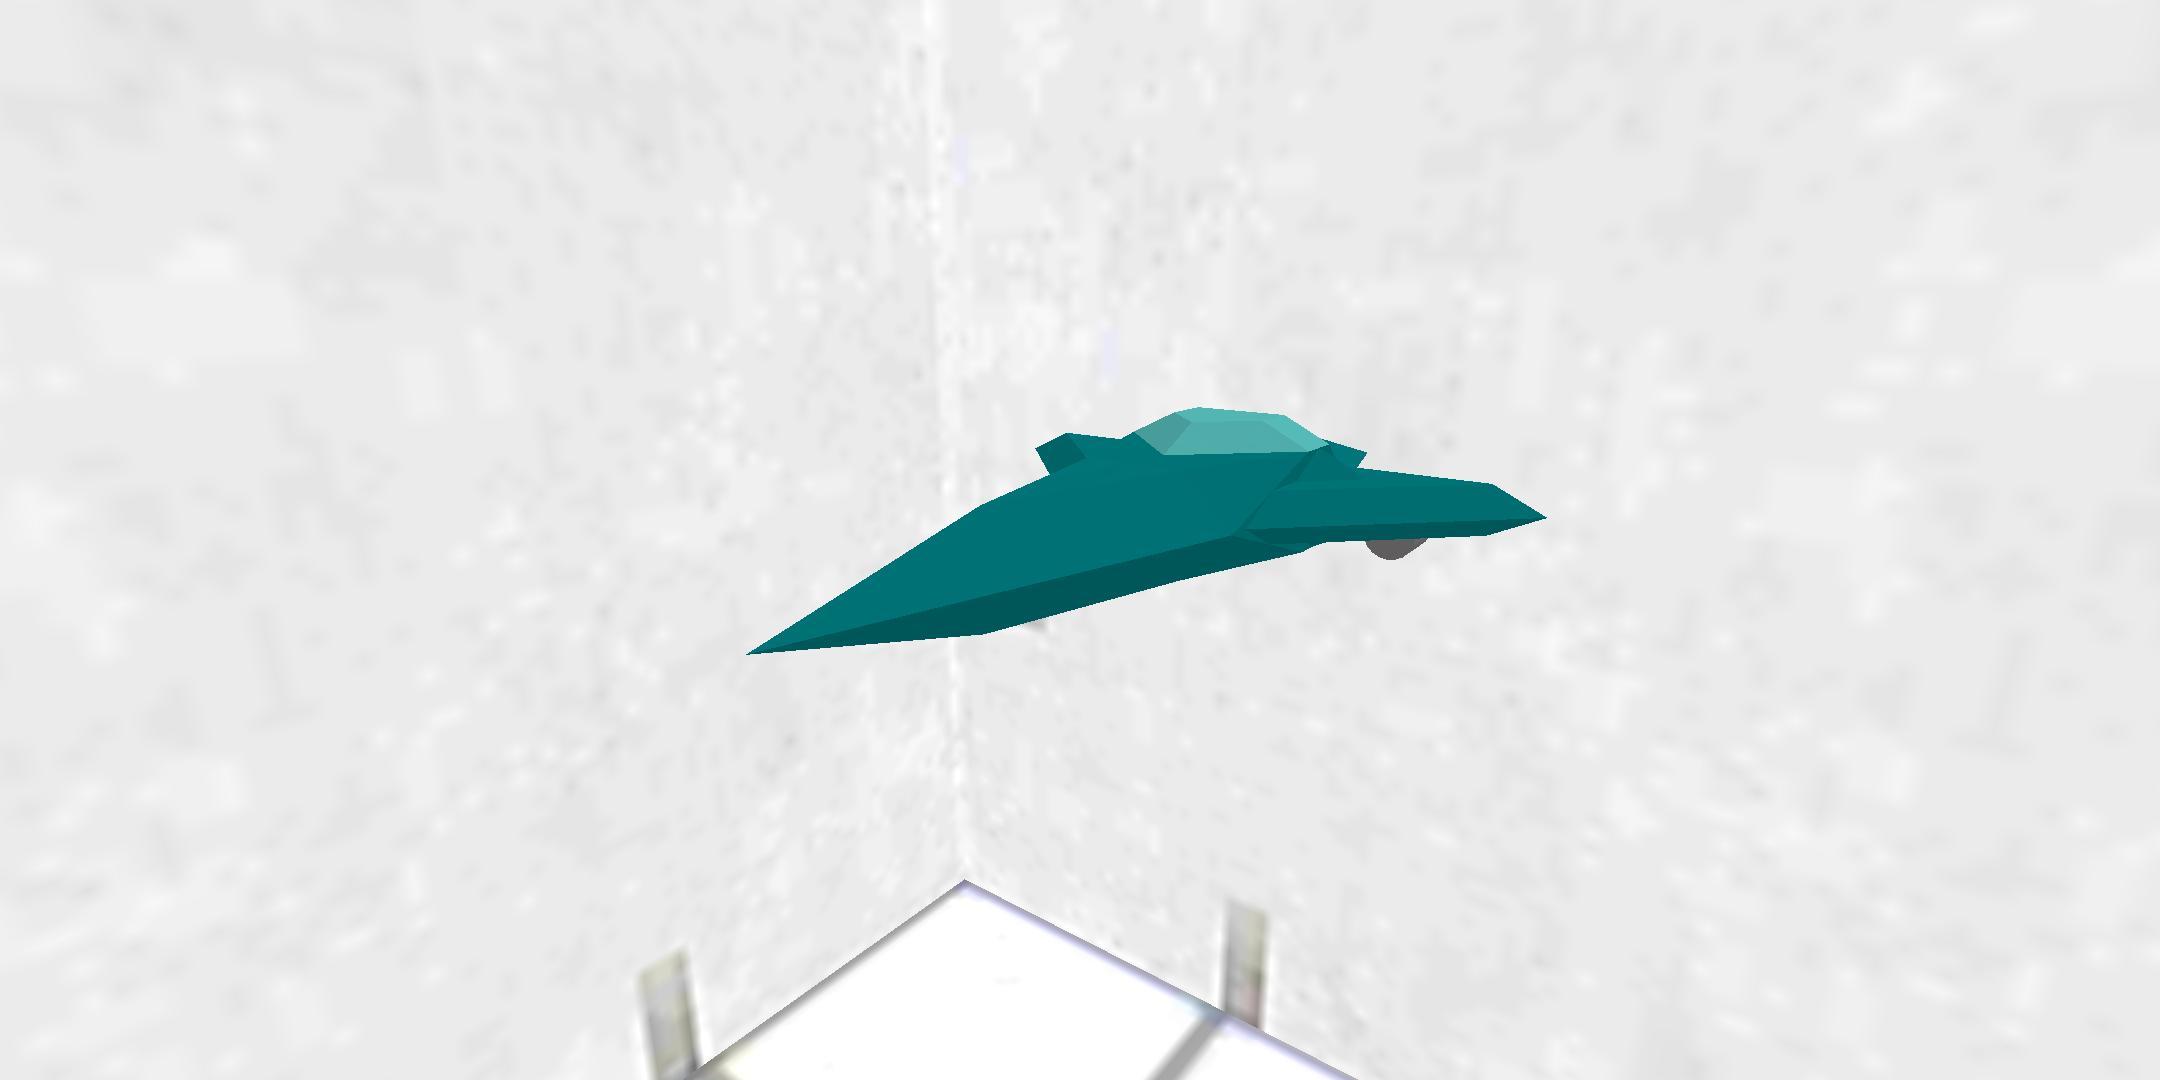 CCA UltraEagle 2020